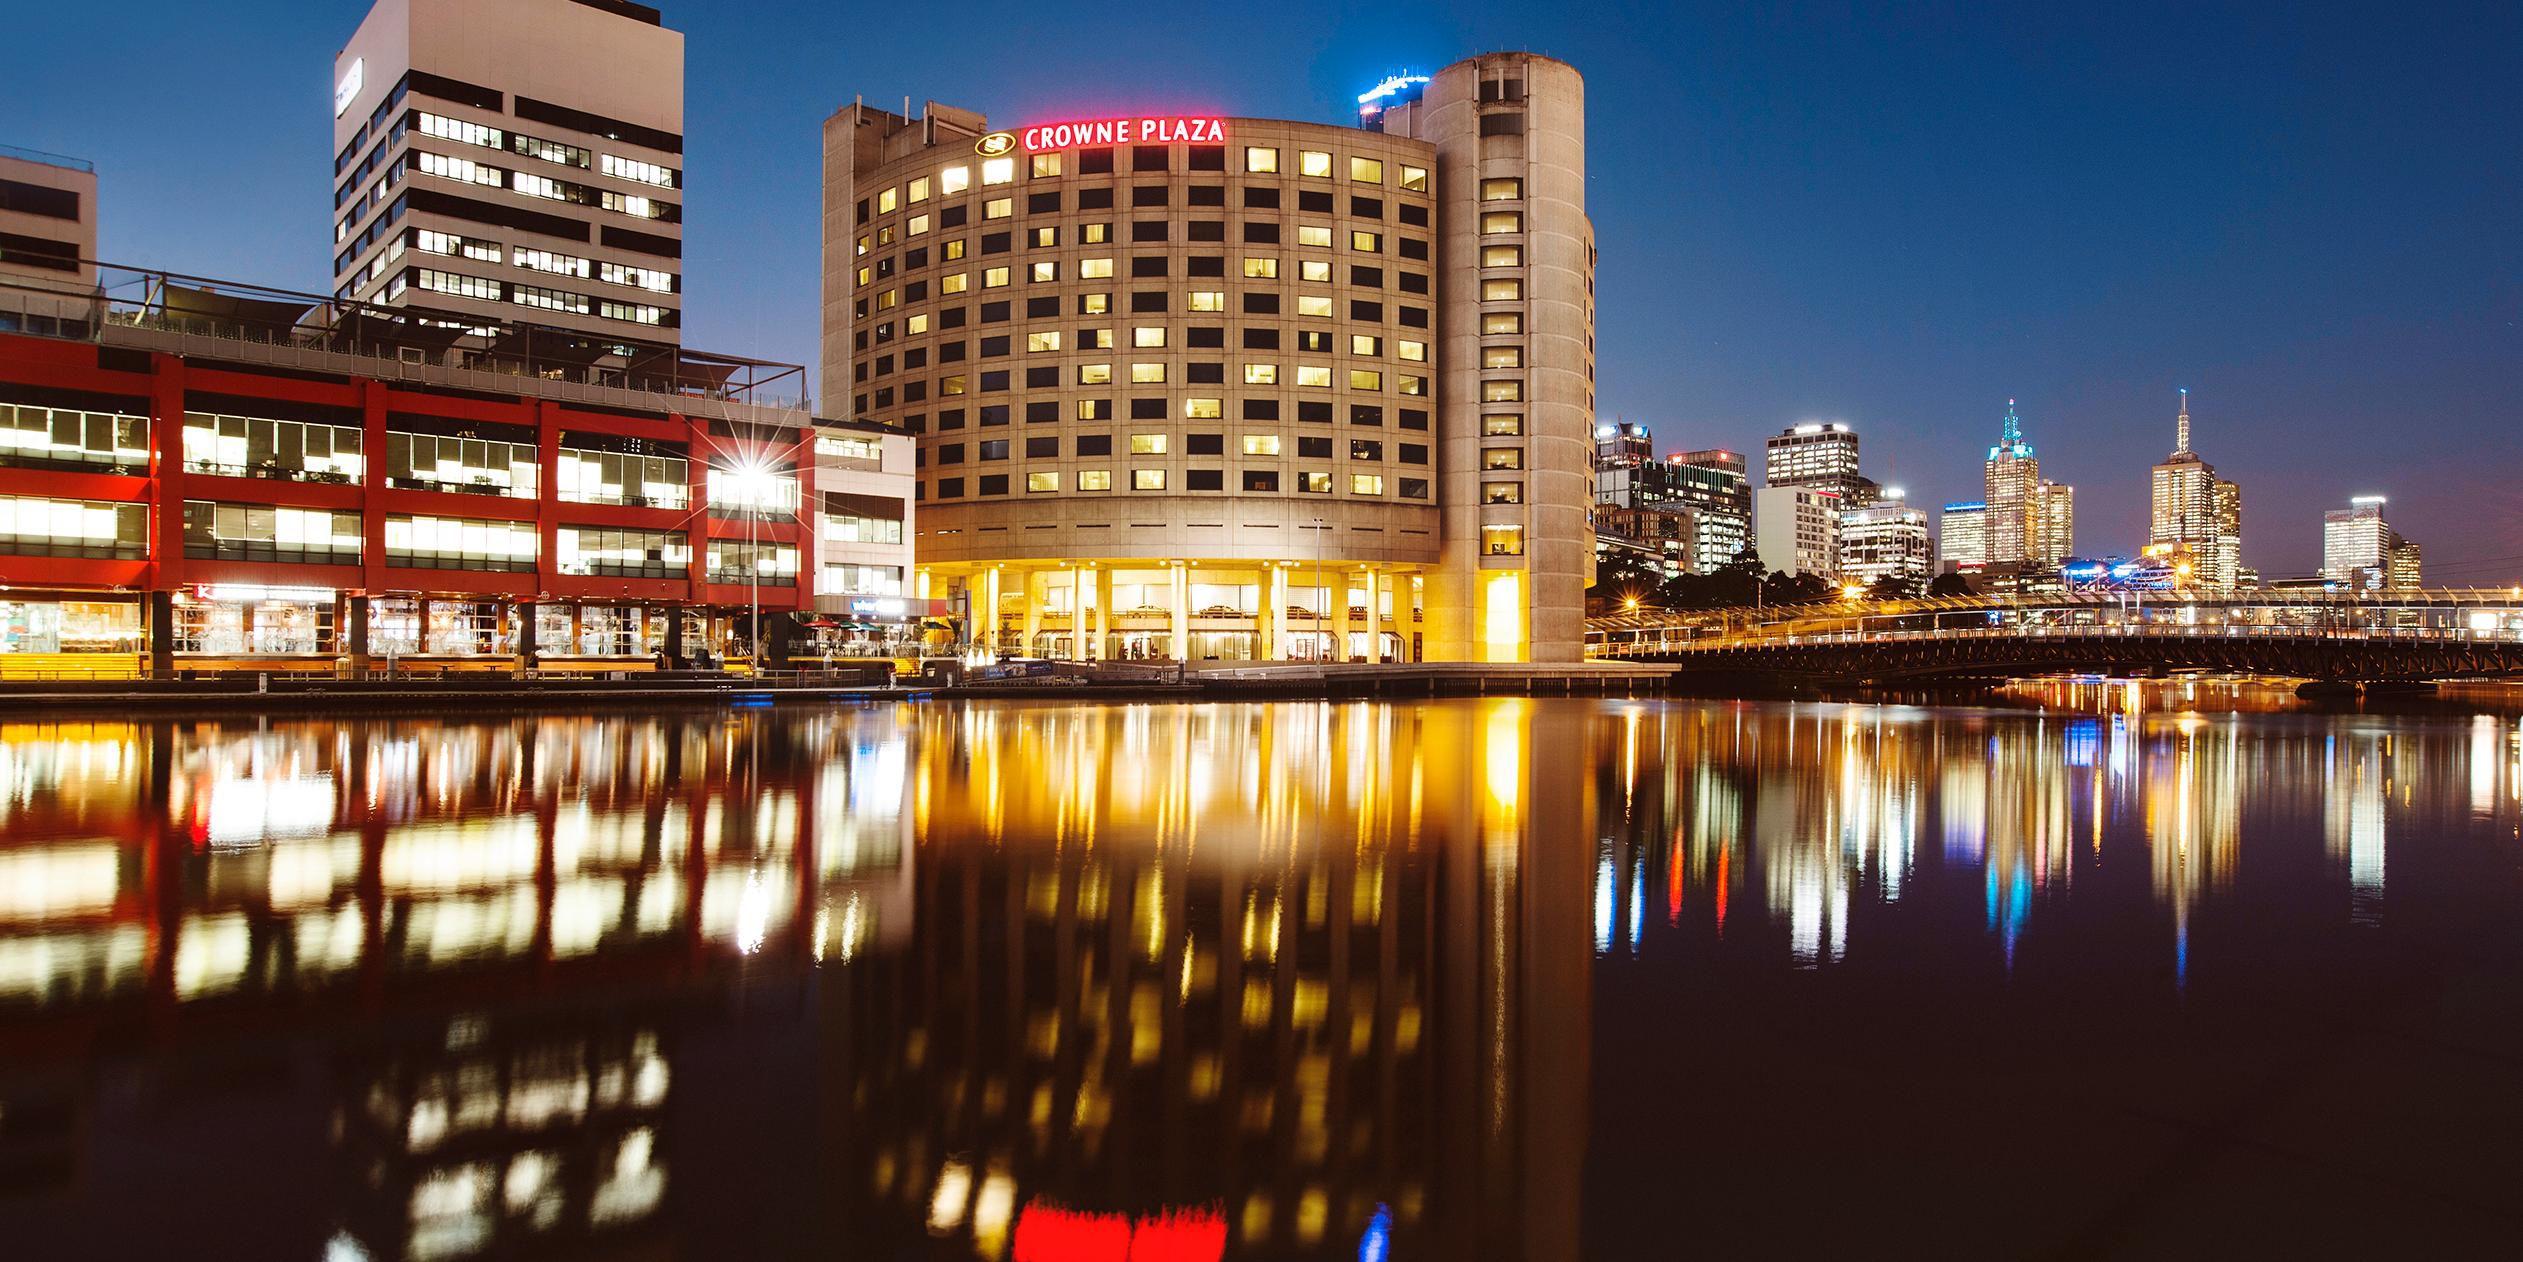 Hotels in melbourne near crown casino wolf run slot machines download